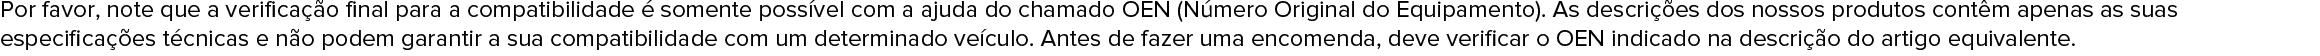 KYB 51601-SMG-G12, 51601-SMG-G13, 51601-SMG-G14, 51601-SMG-G15, 51601-SMG-G16 Amortecedor